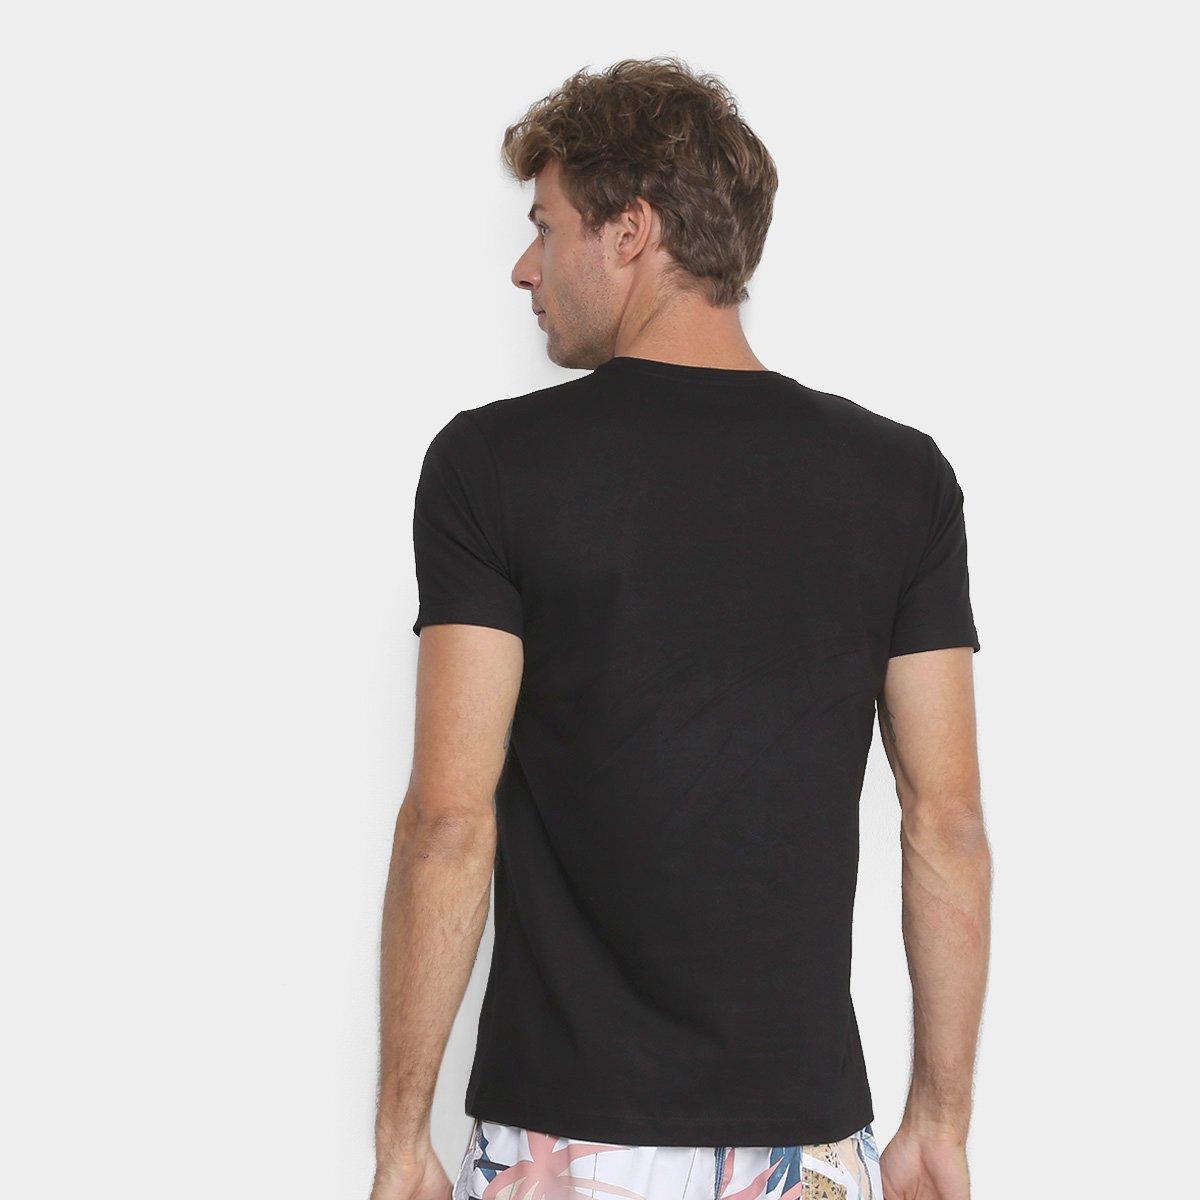 Camiseta Handbook No Stress Masculina - Preto